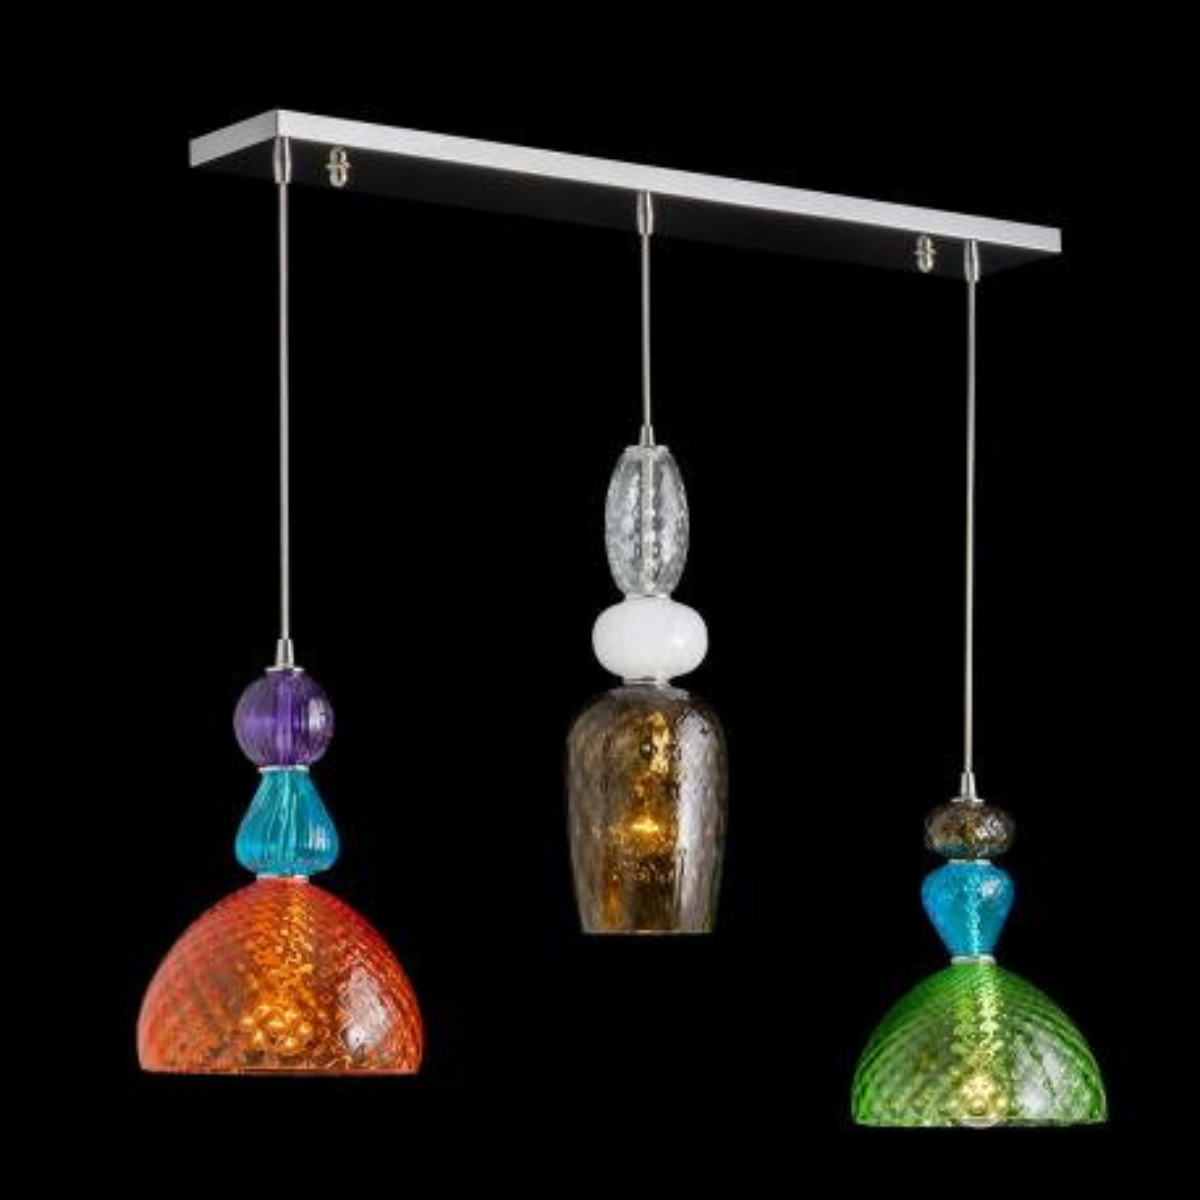 Mavis Murano Gl Pendant Light 3 Lights Multicolor